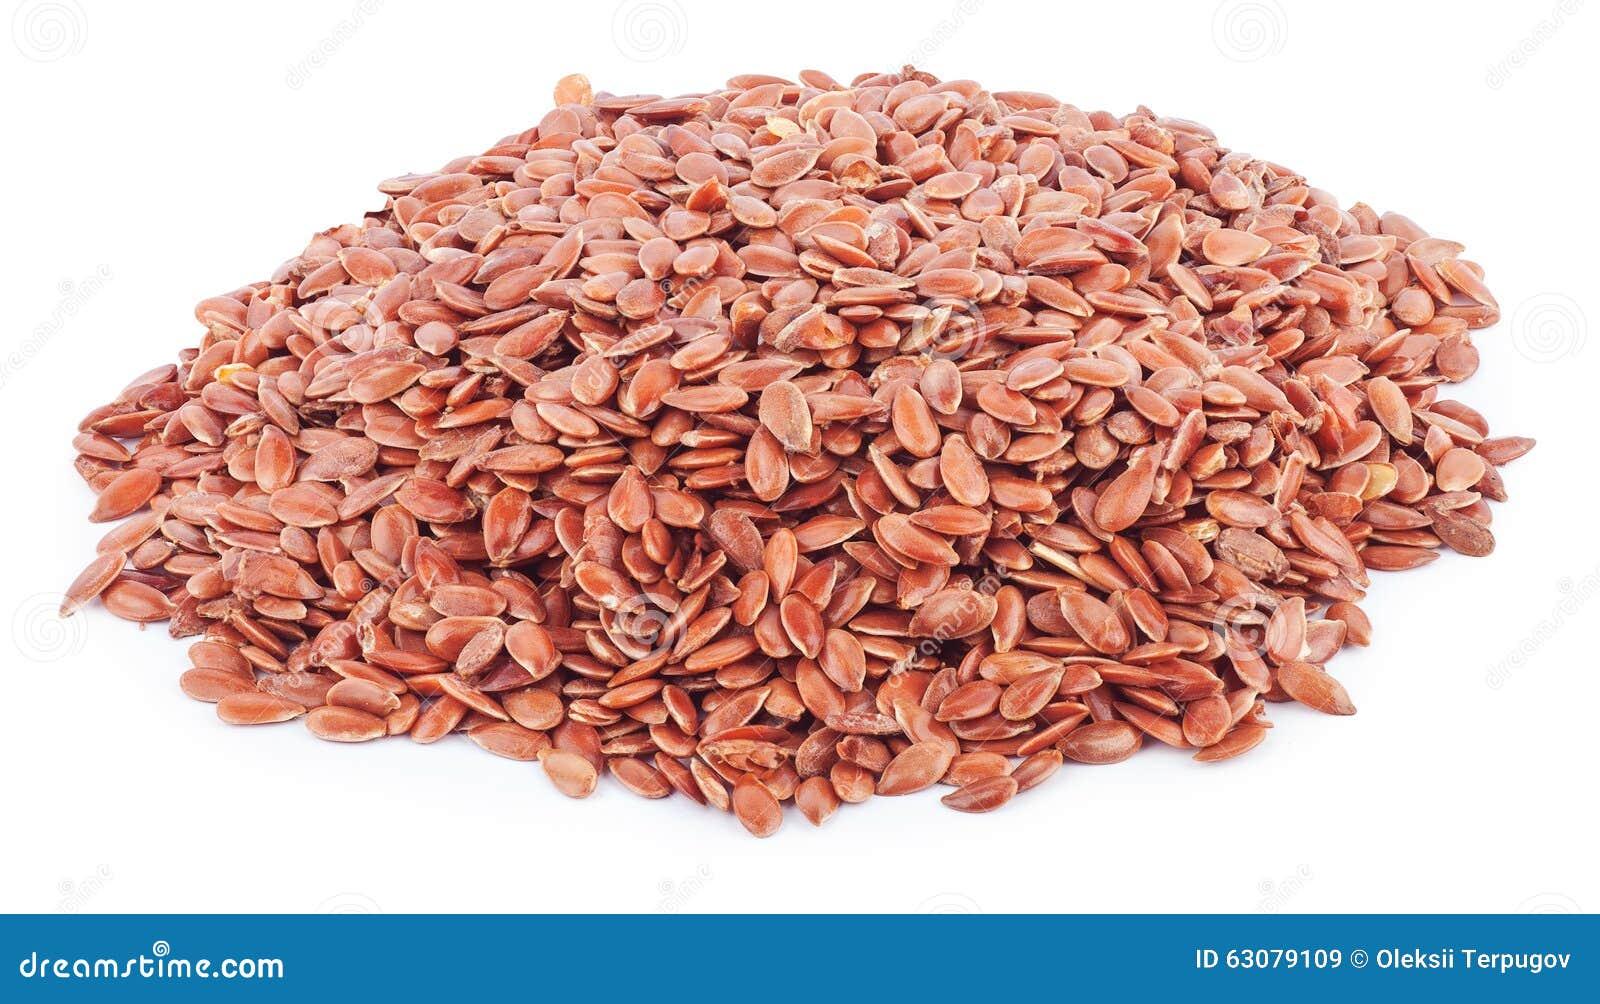 Download Graines d'isolat de lin image stock. Image du flaxseed - 63079109